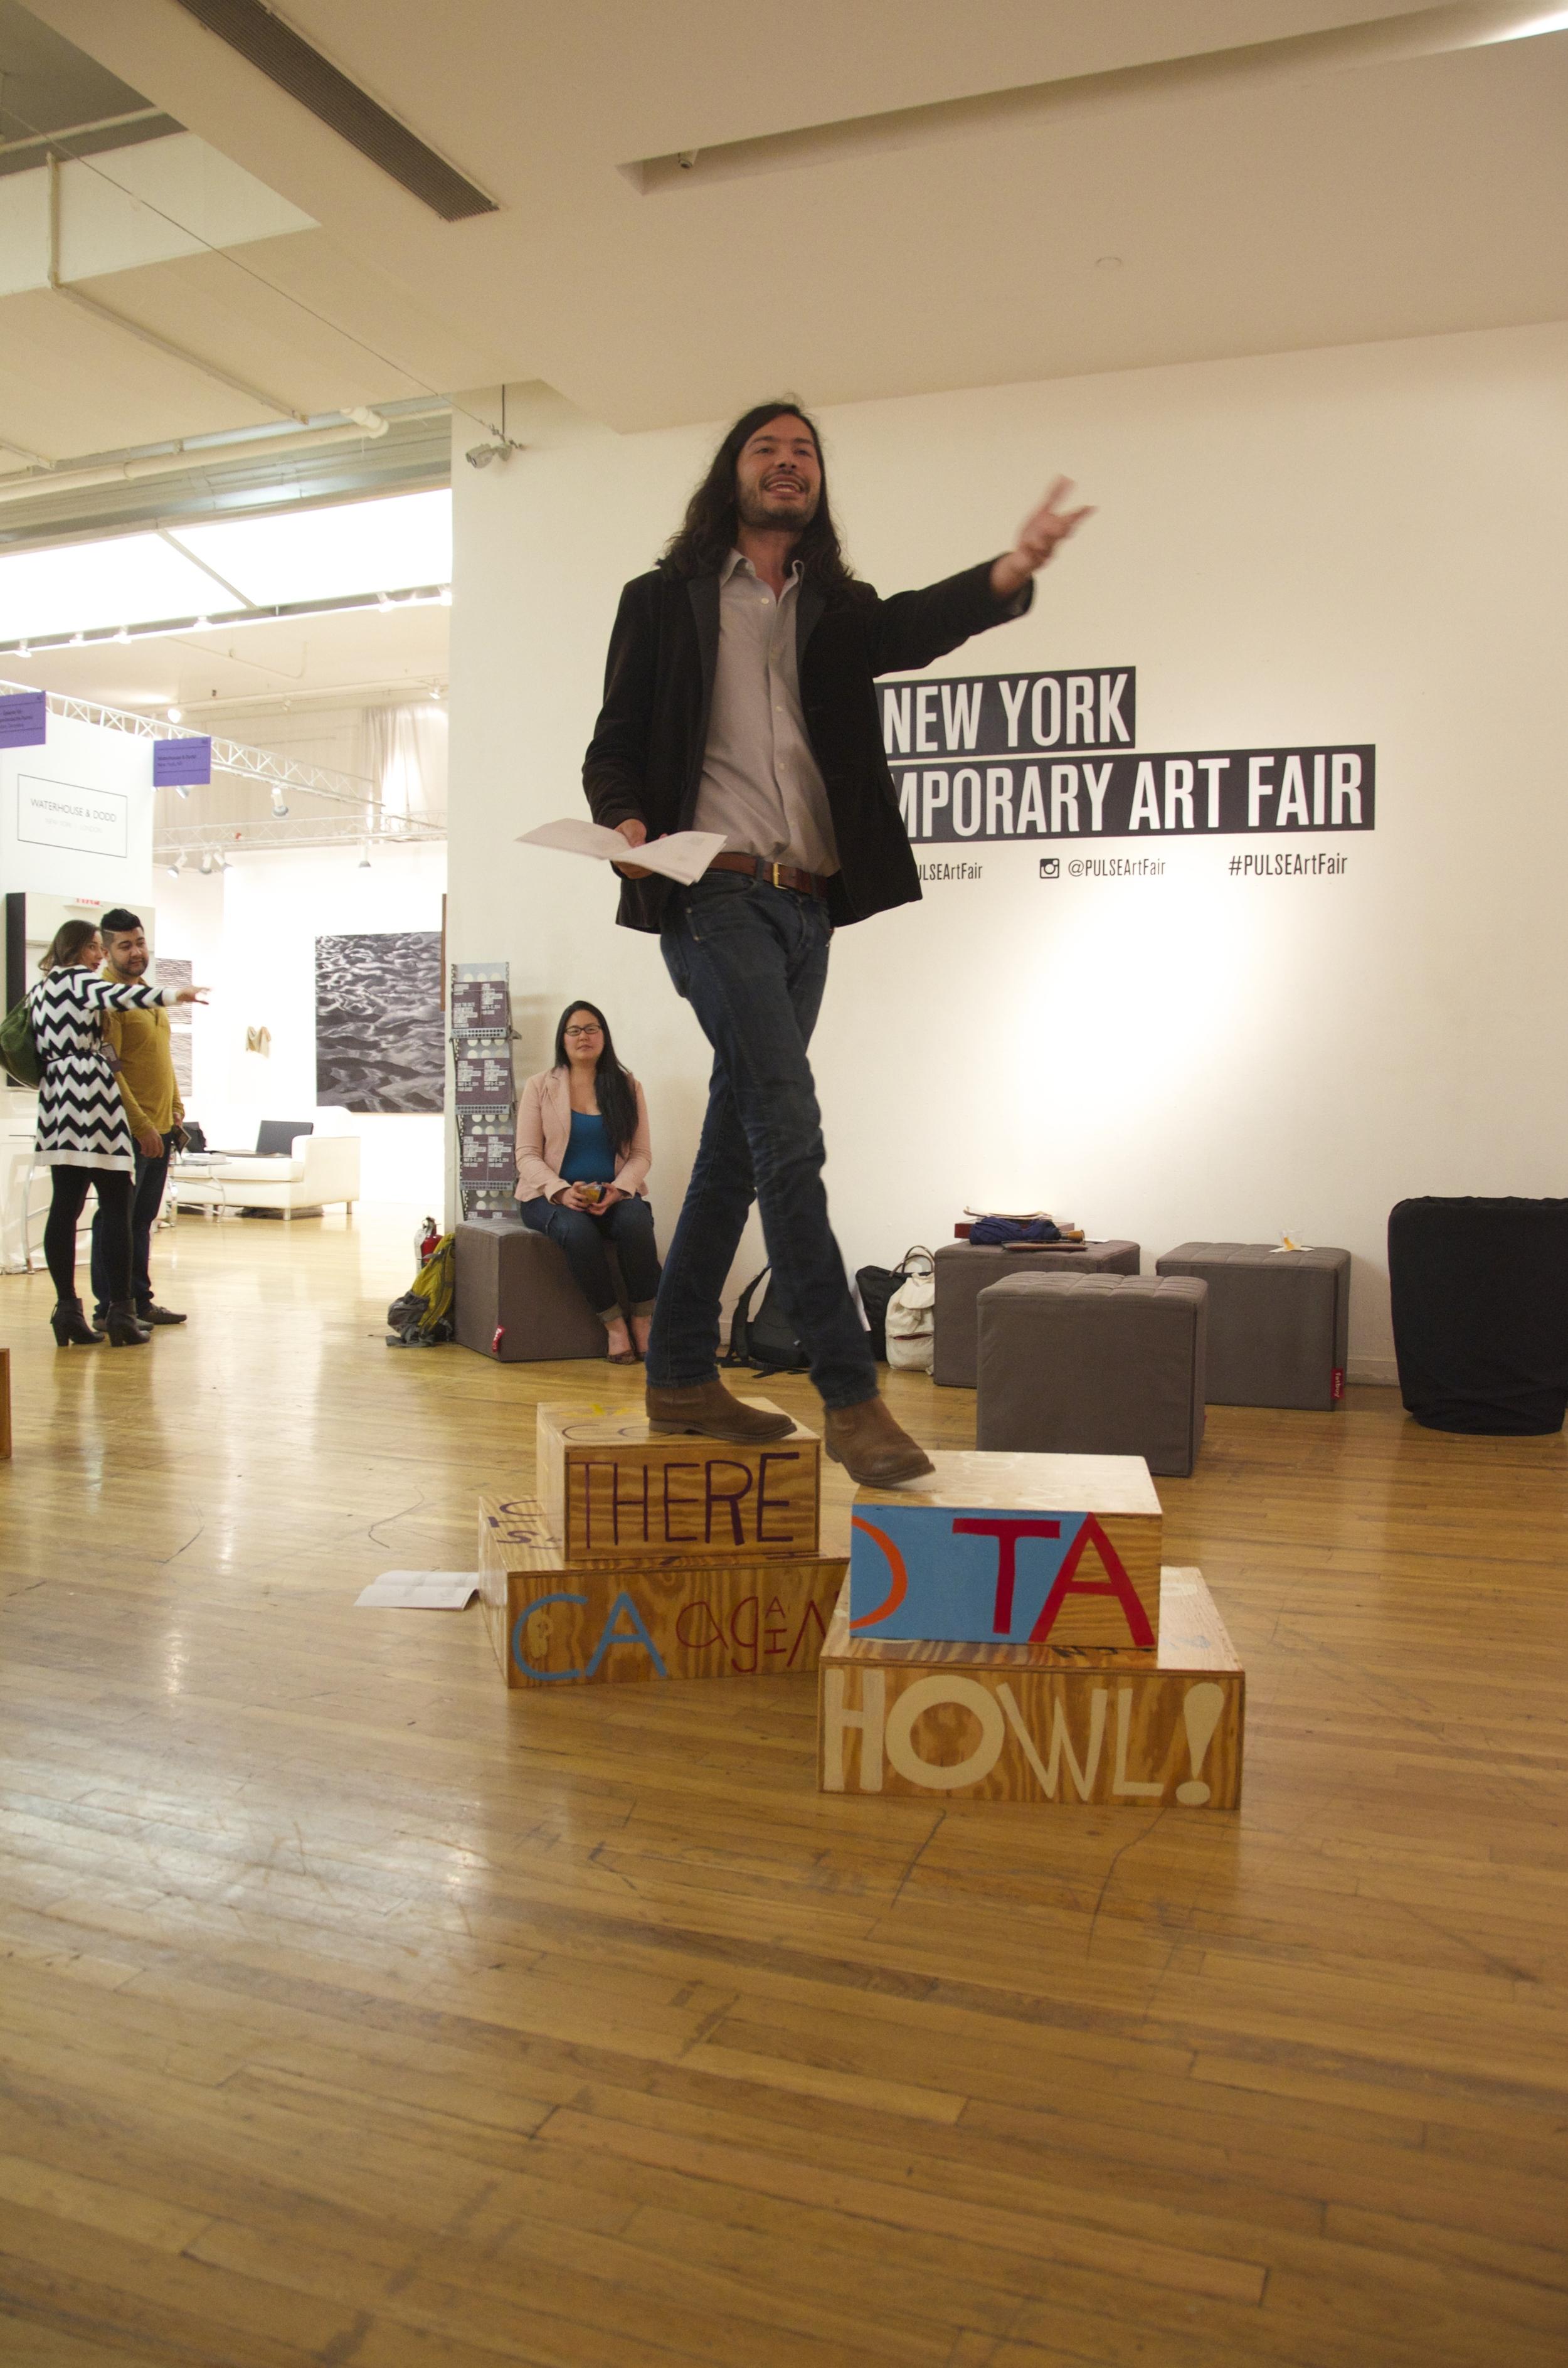 Poet Sculpture PULSE Art Fair, Nikhil Melnechuk, New York, NY 2014.jpg